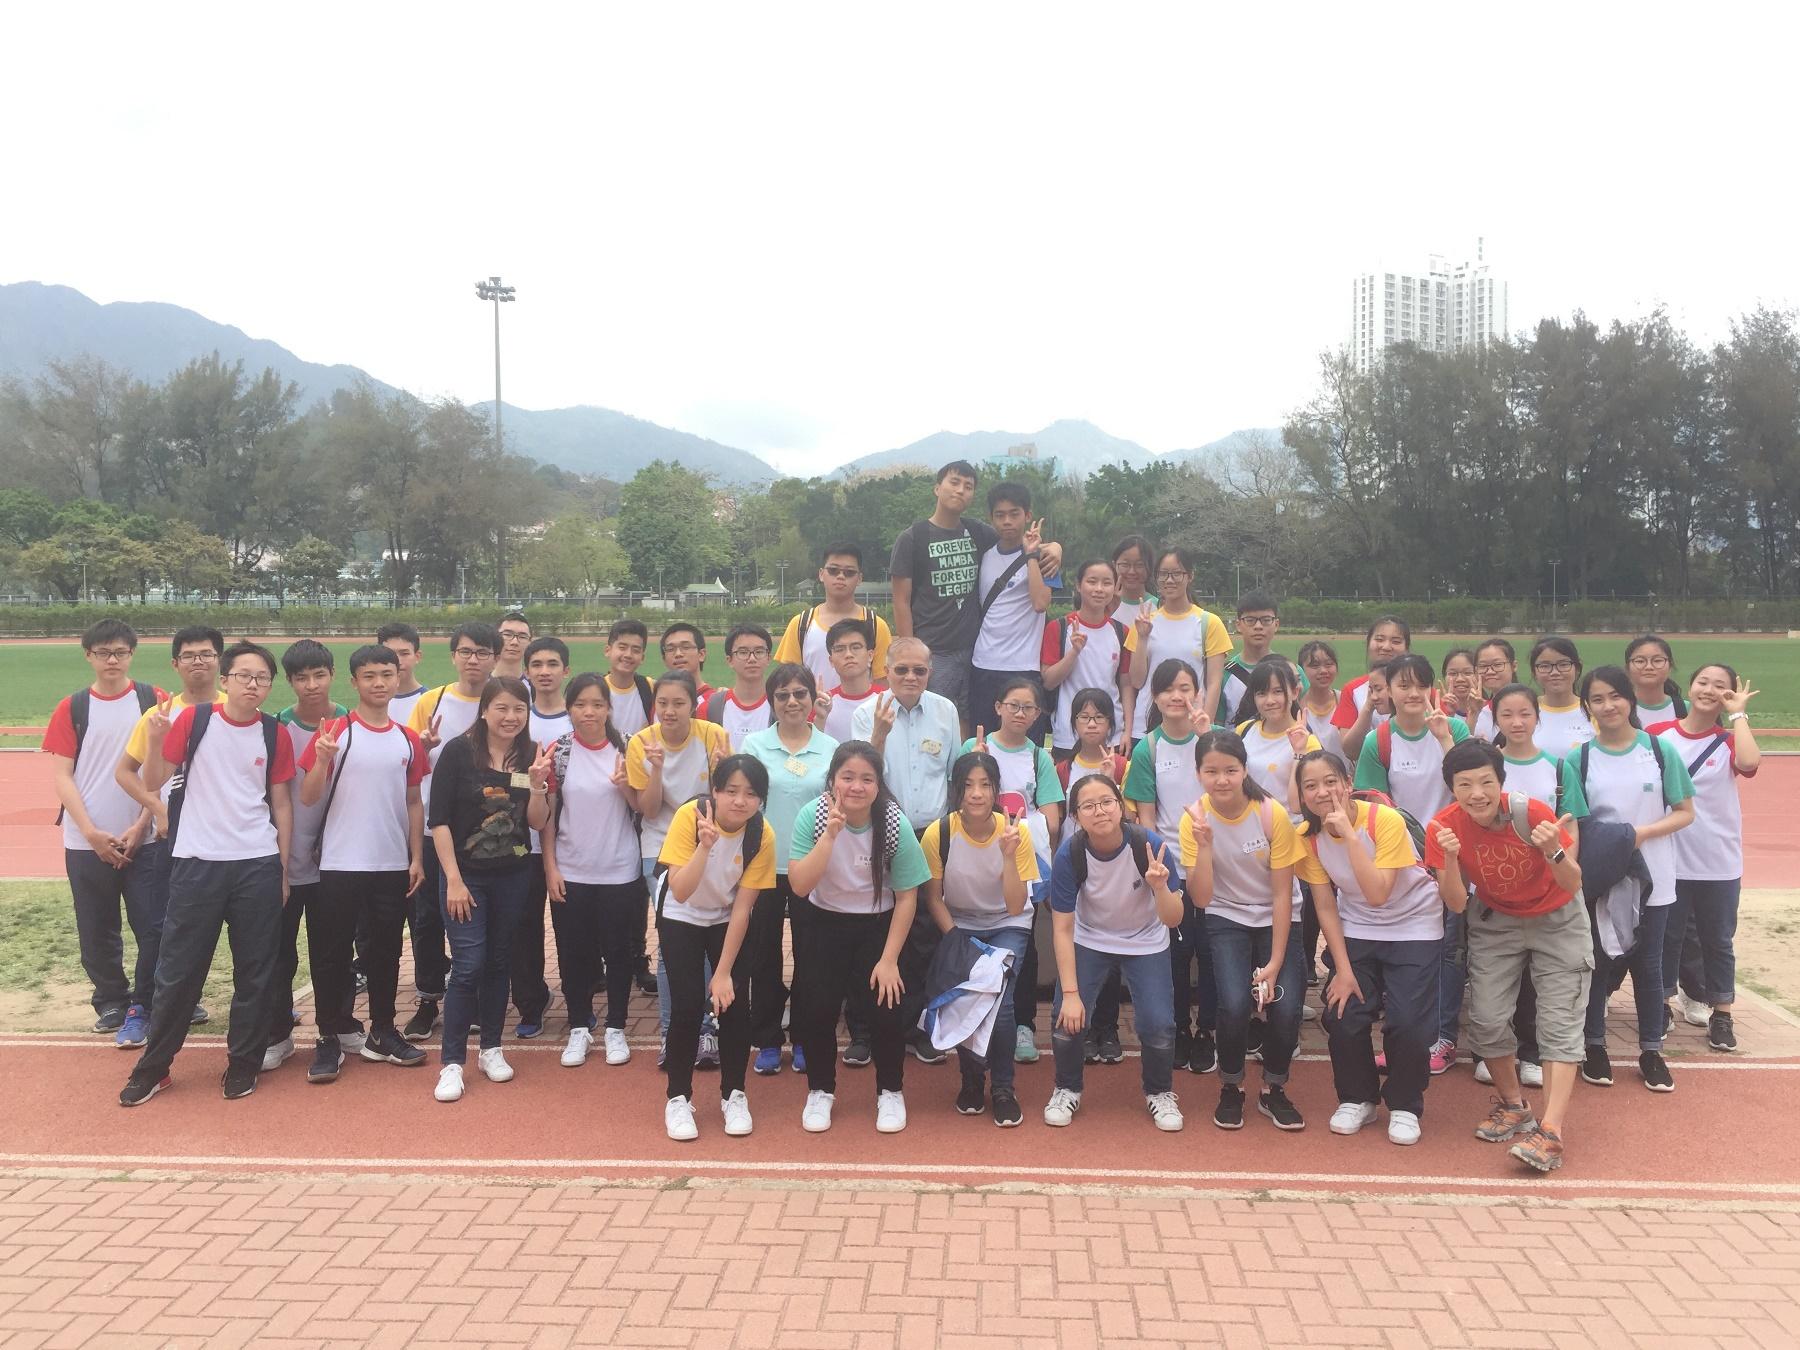 http://npc.edu.hk/sites/default/files/img_4487.jpg